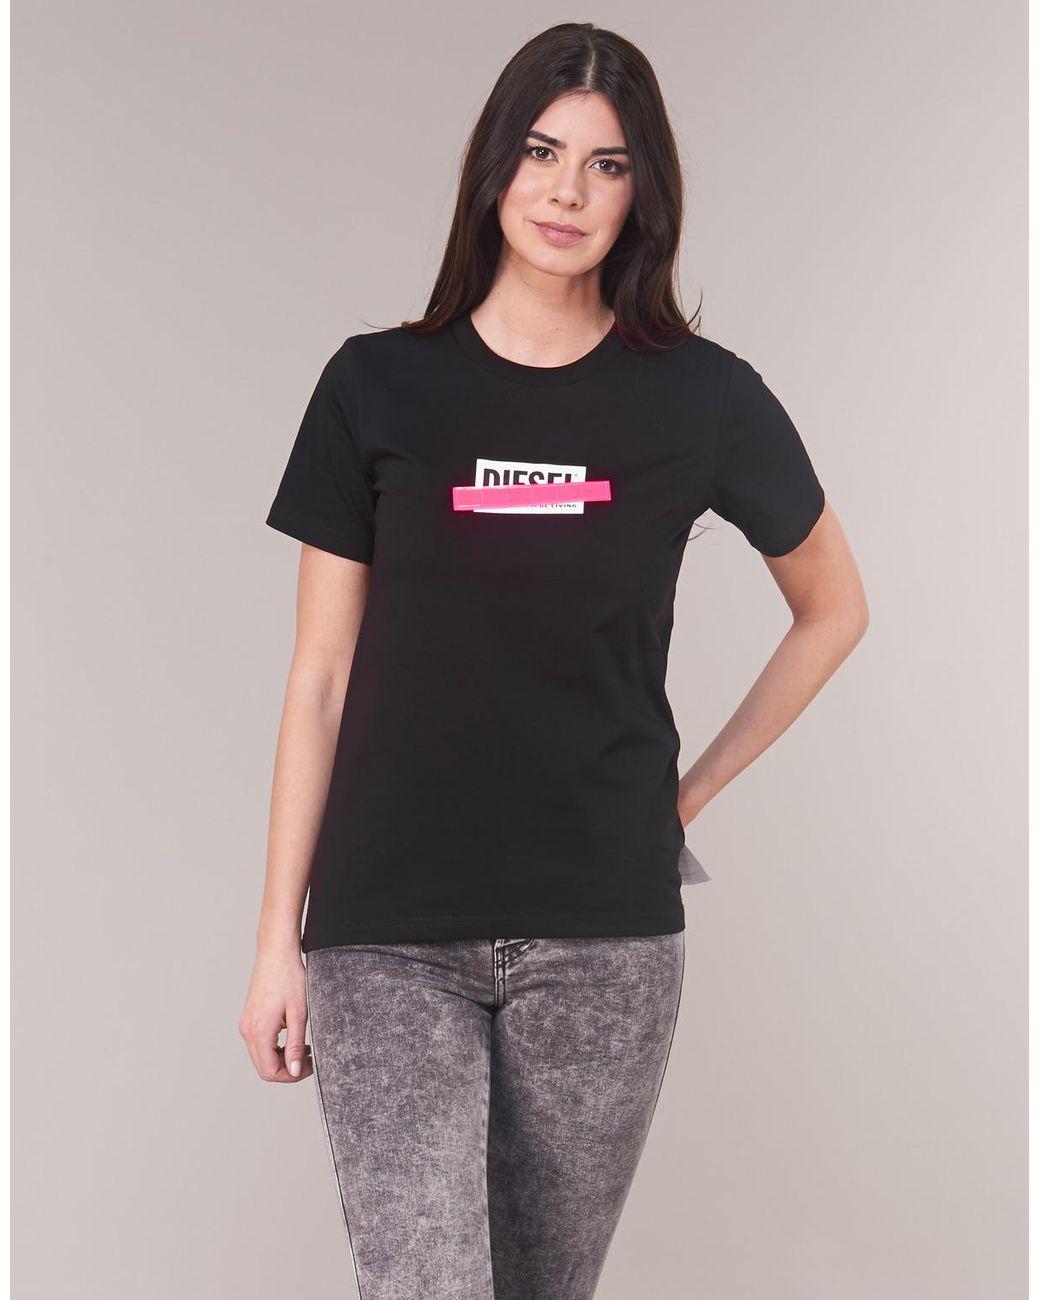 T Sily Women's T Shirt In Black